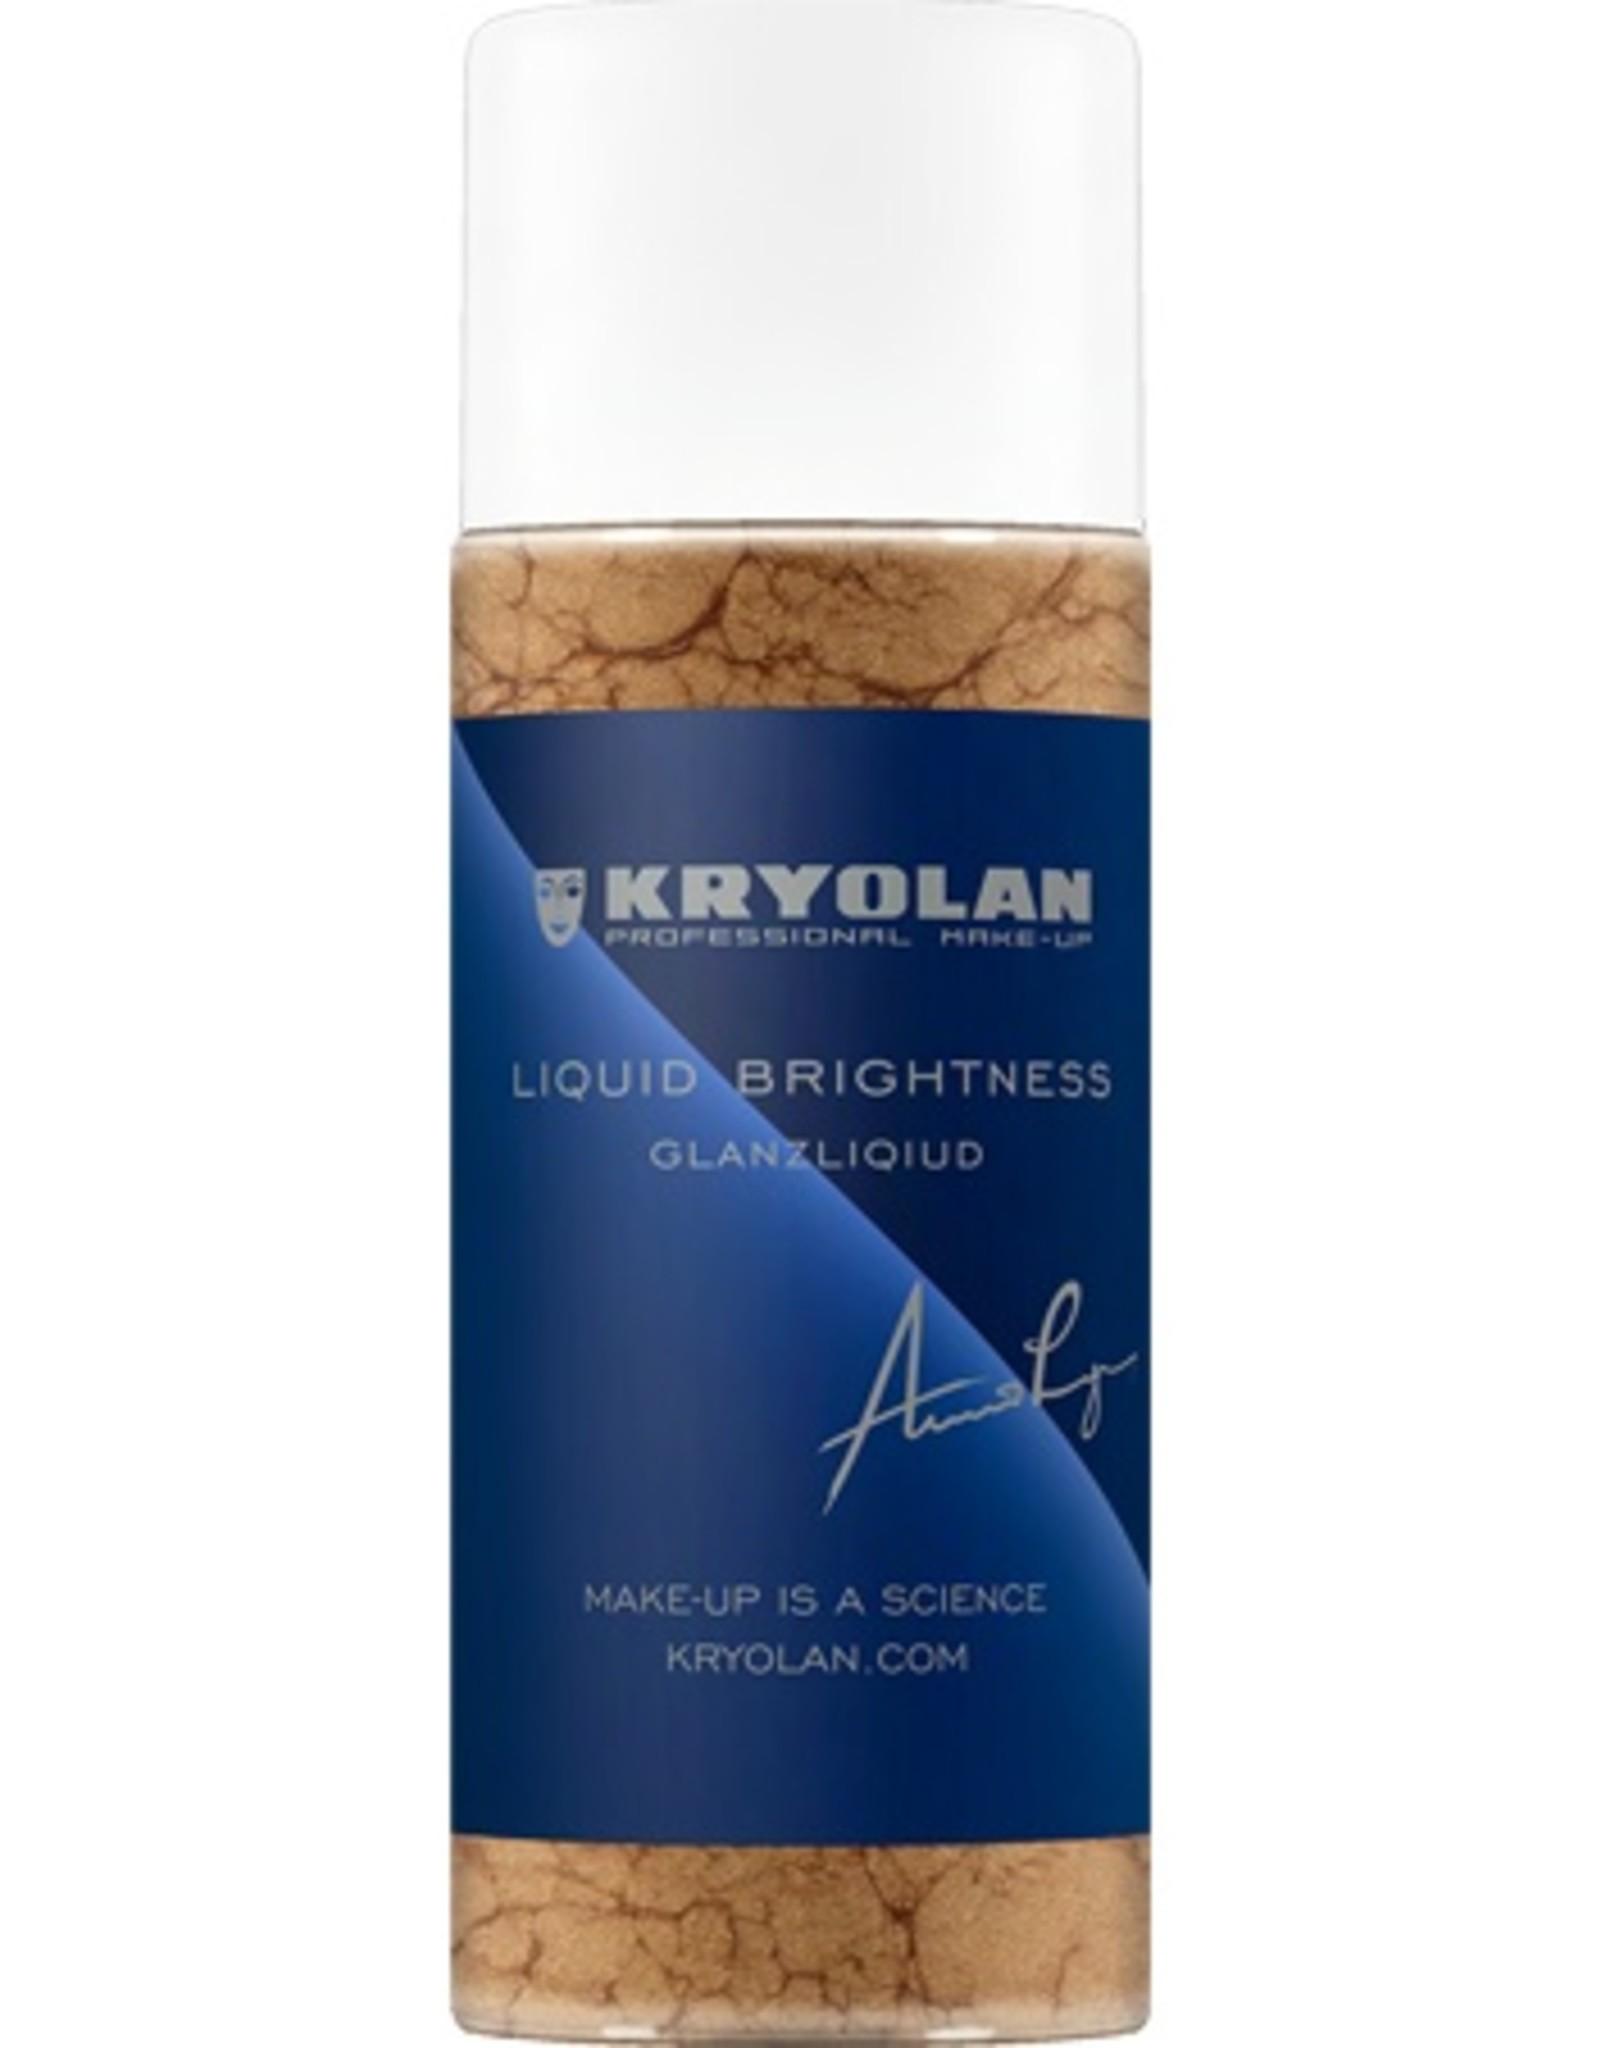 Kryolan Kryolan Liquid Brightness Body Makeup